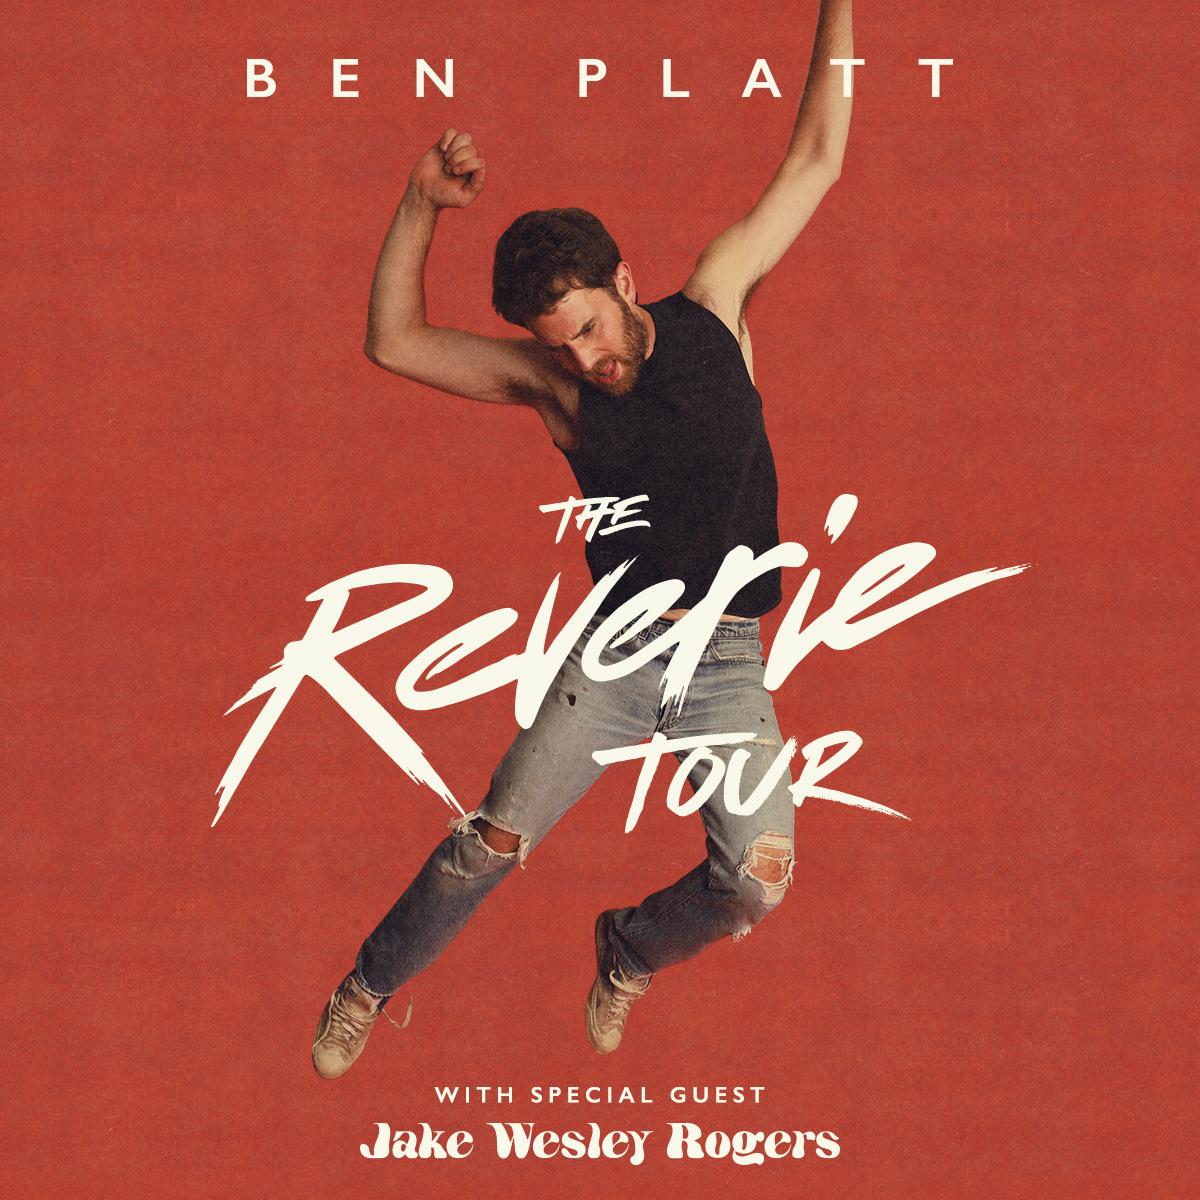 'Text to Win' tickets to see Ben Platt Live at the Santa Barbara Bowl all this week!